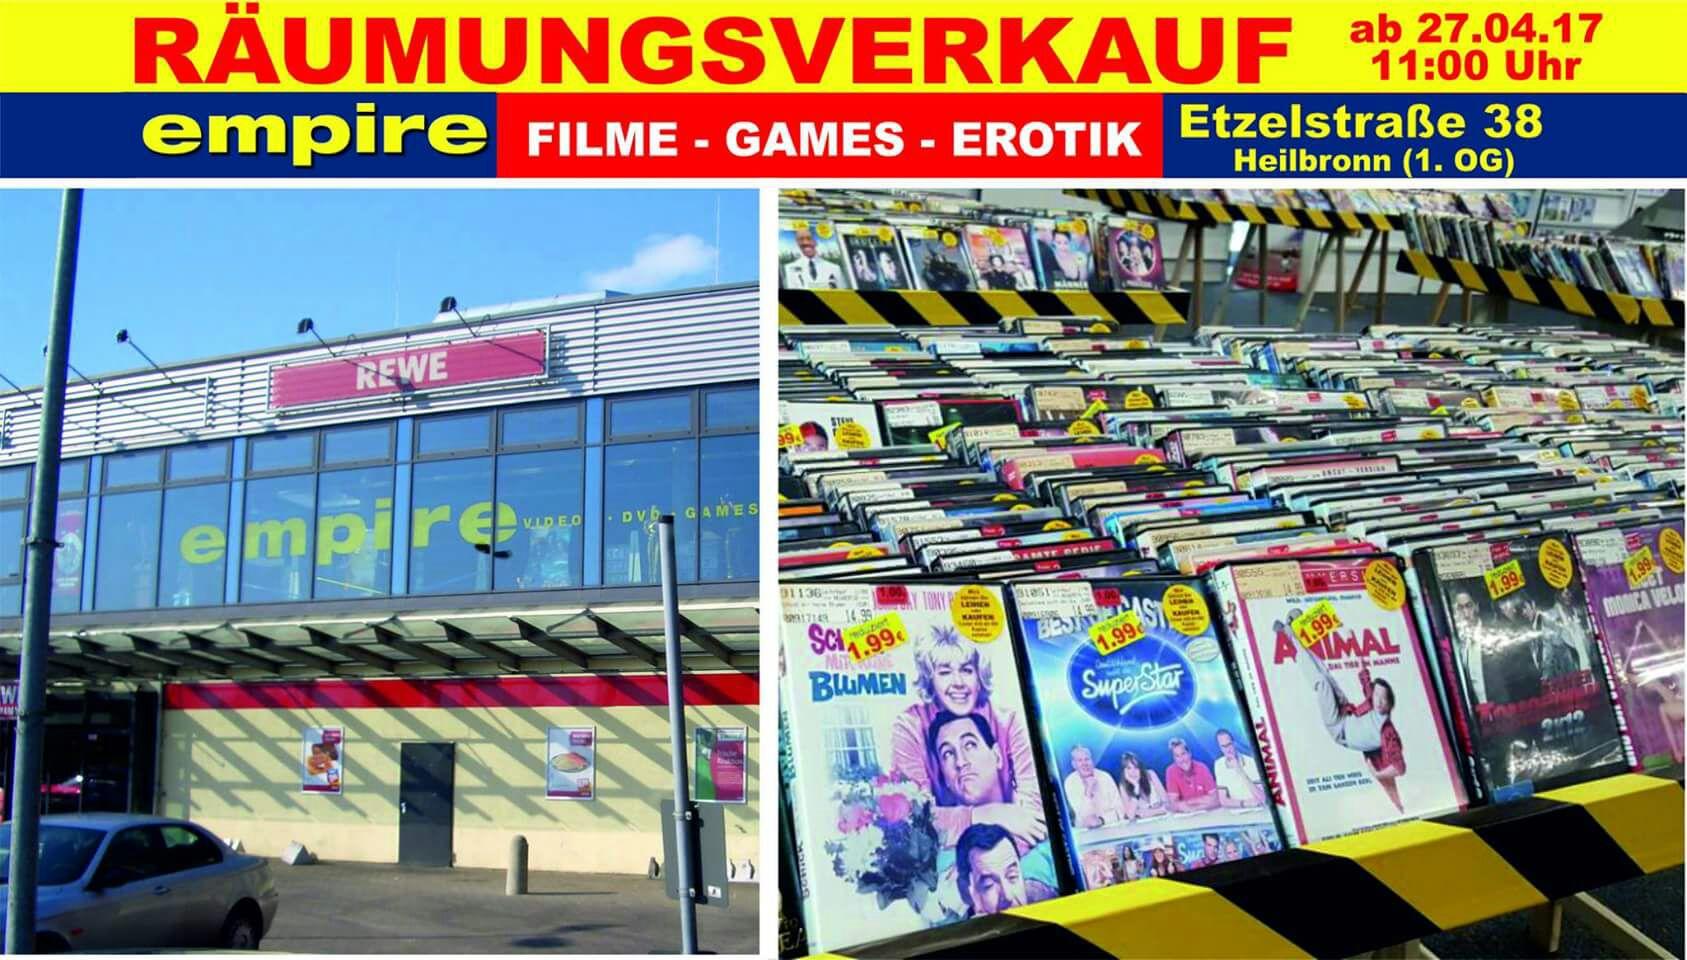 Videothek Empire [Heilbronn] Räumungsverkauf DVD/BR/Games